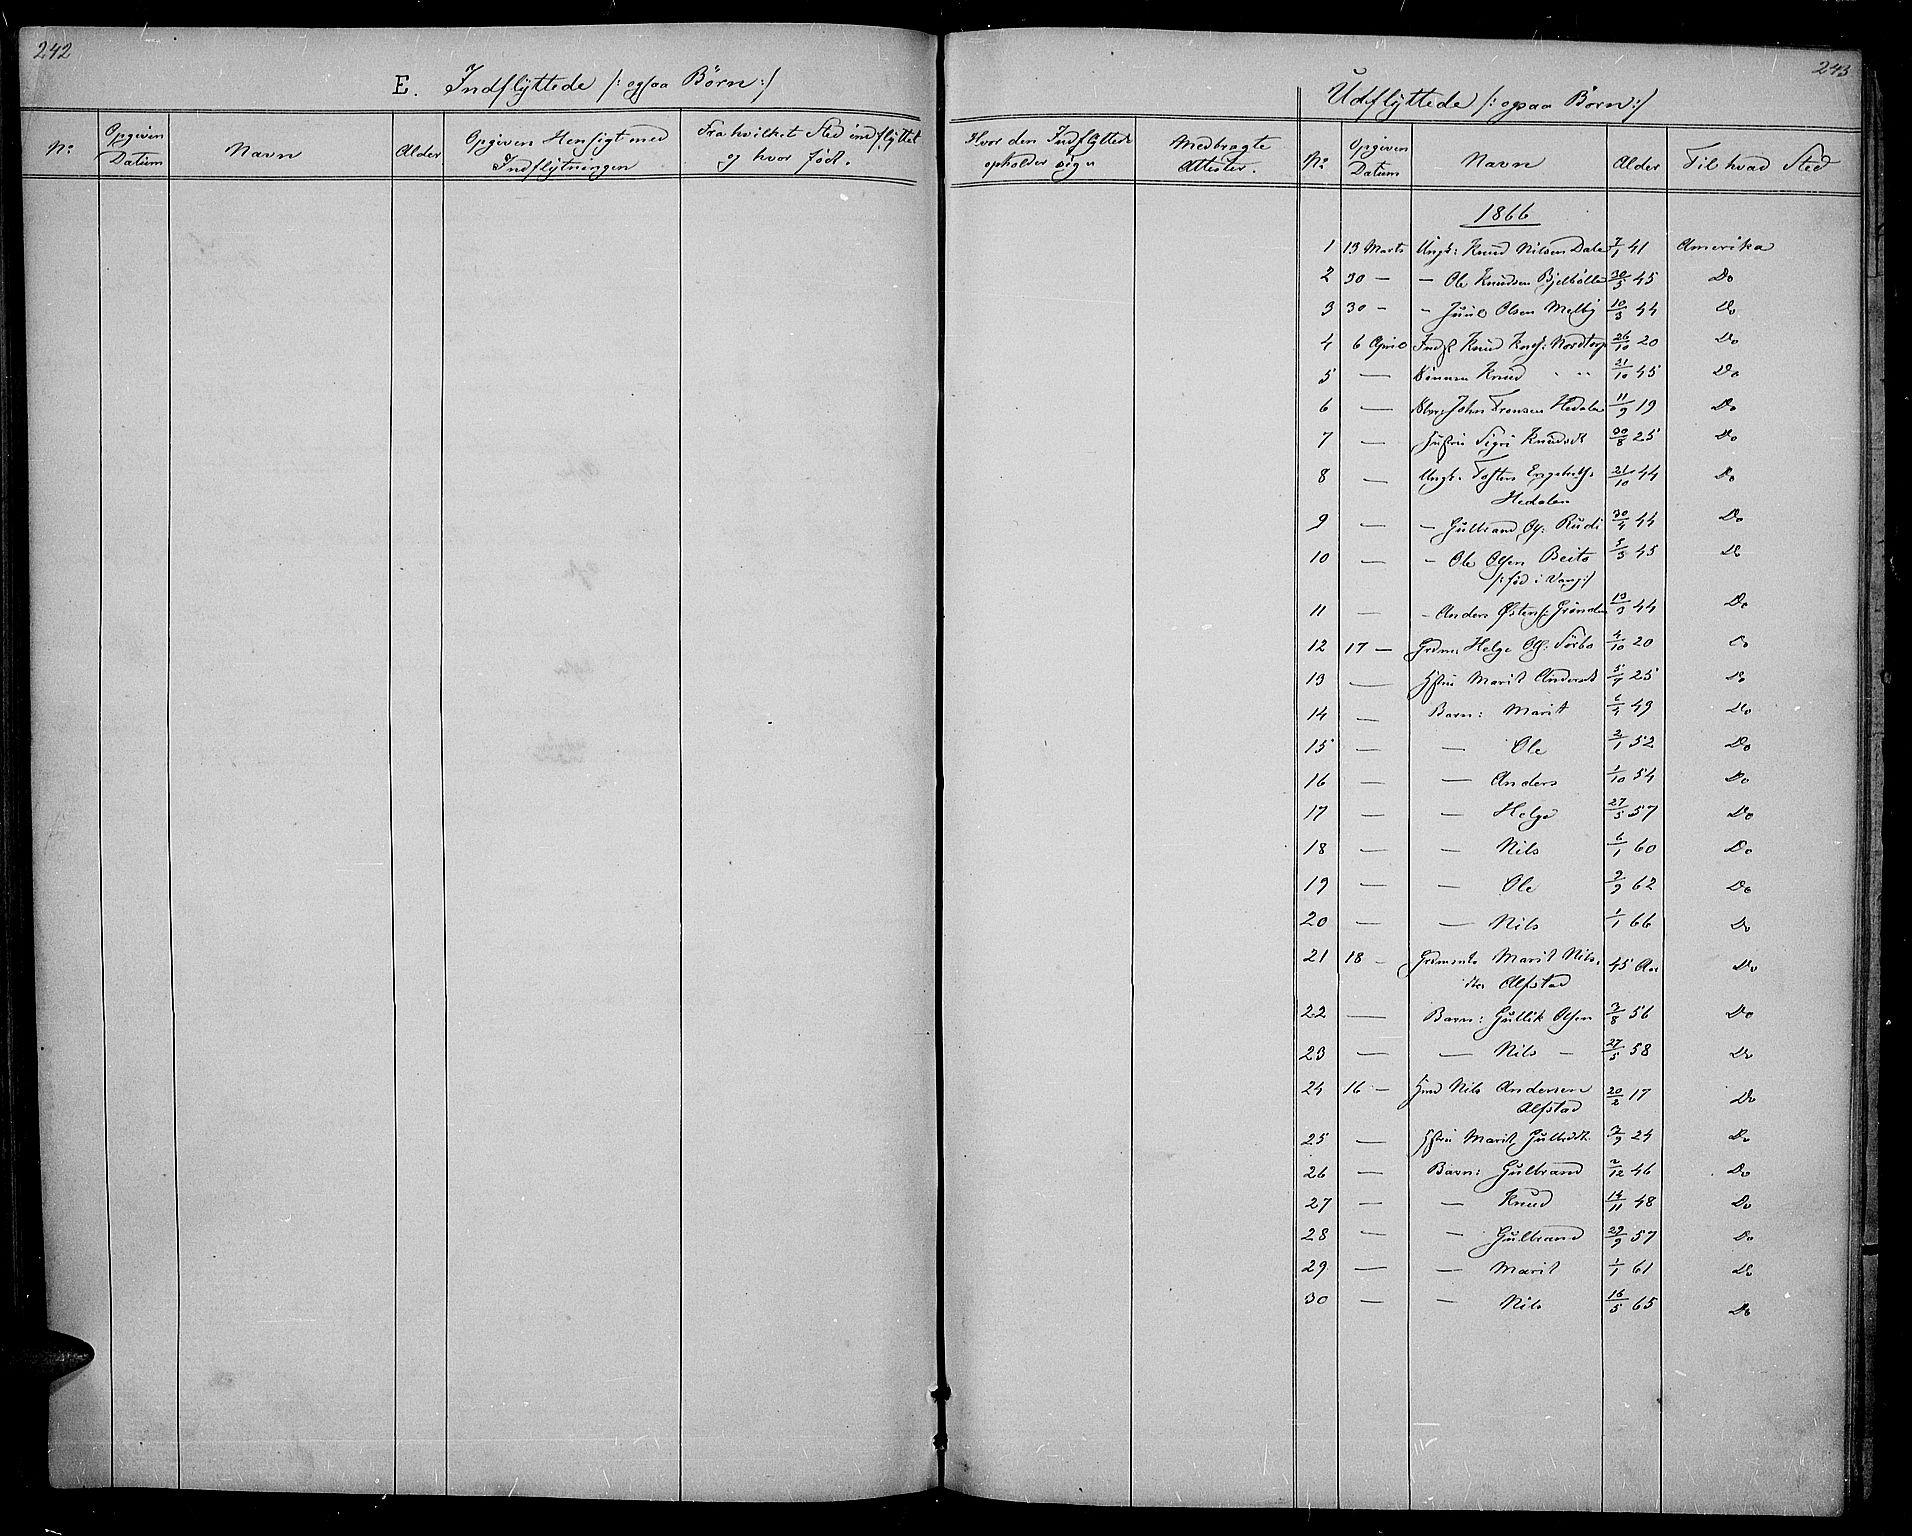 SAH, Øystre Slidre prestekontor, Klokkerbok nr. 1, 1866-1886, s. 242-243